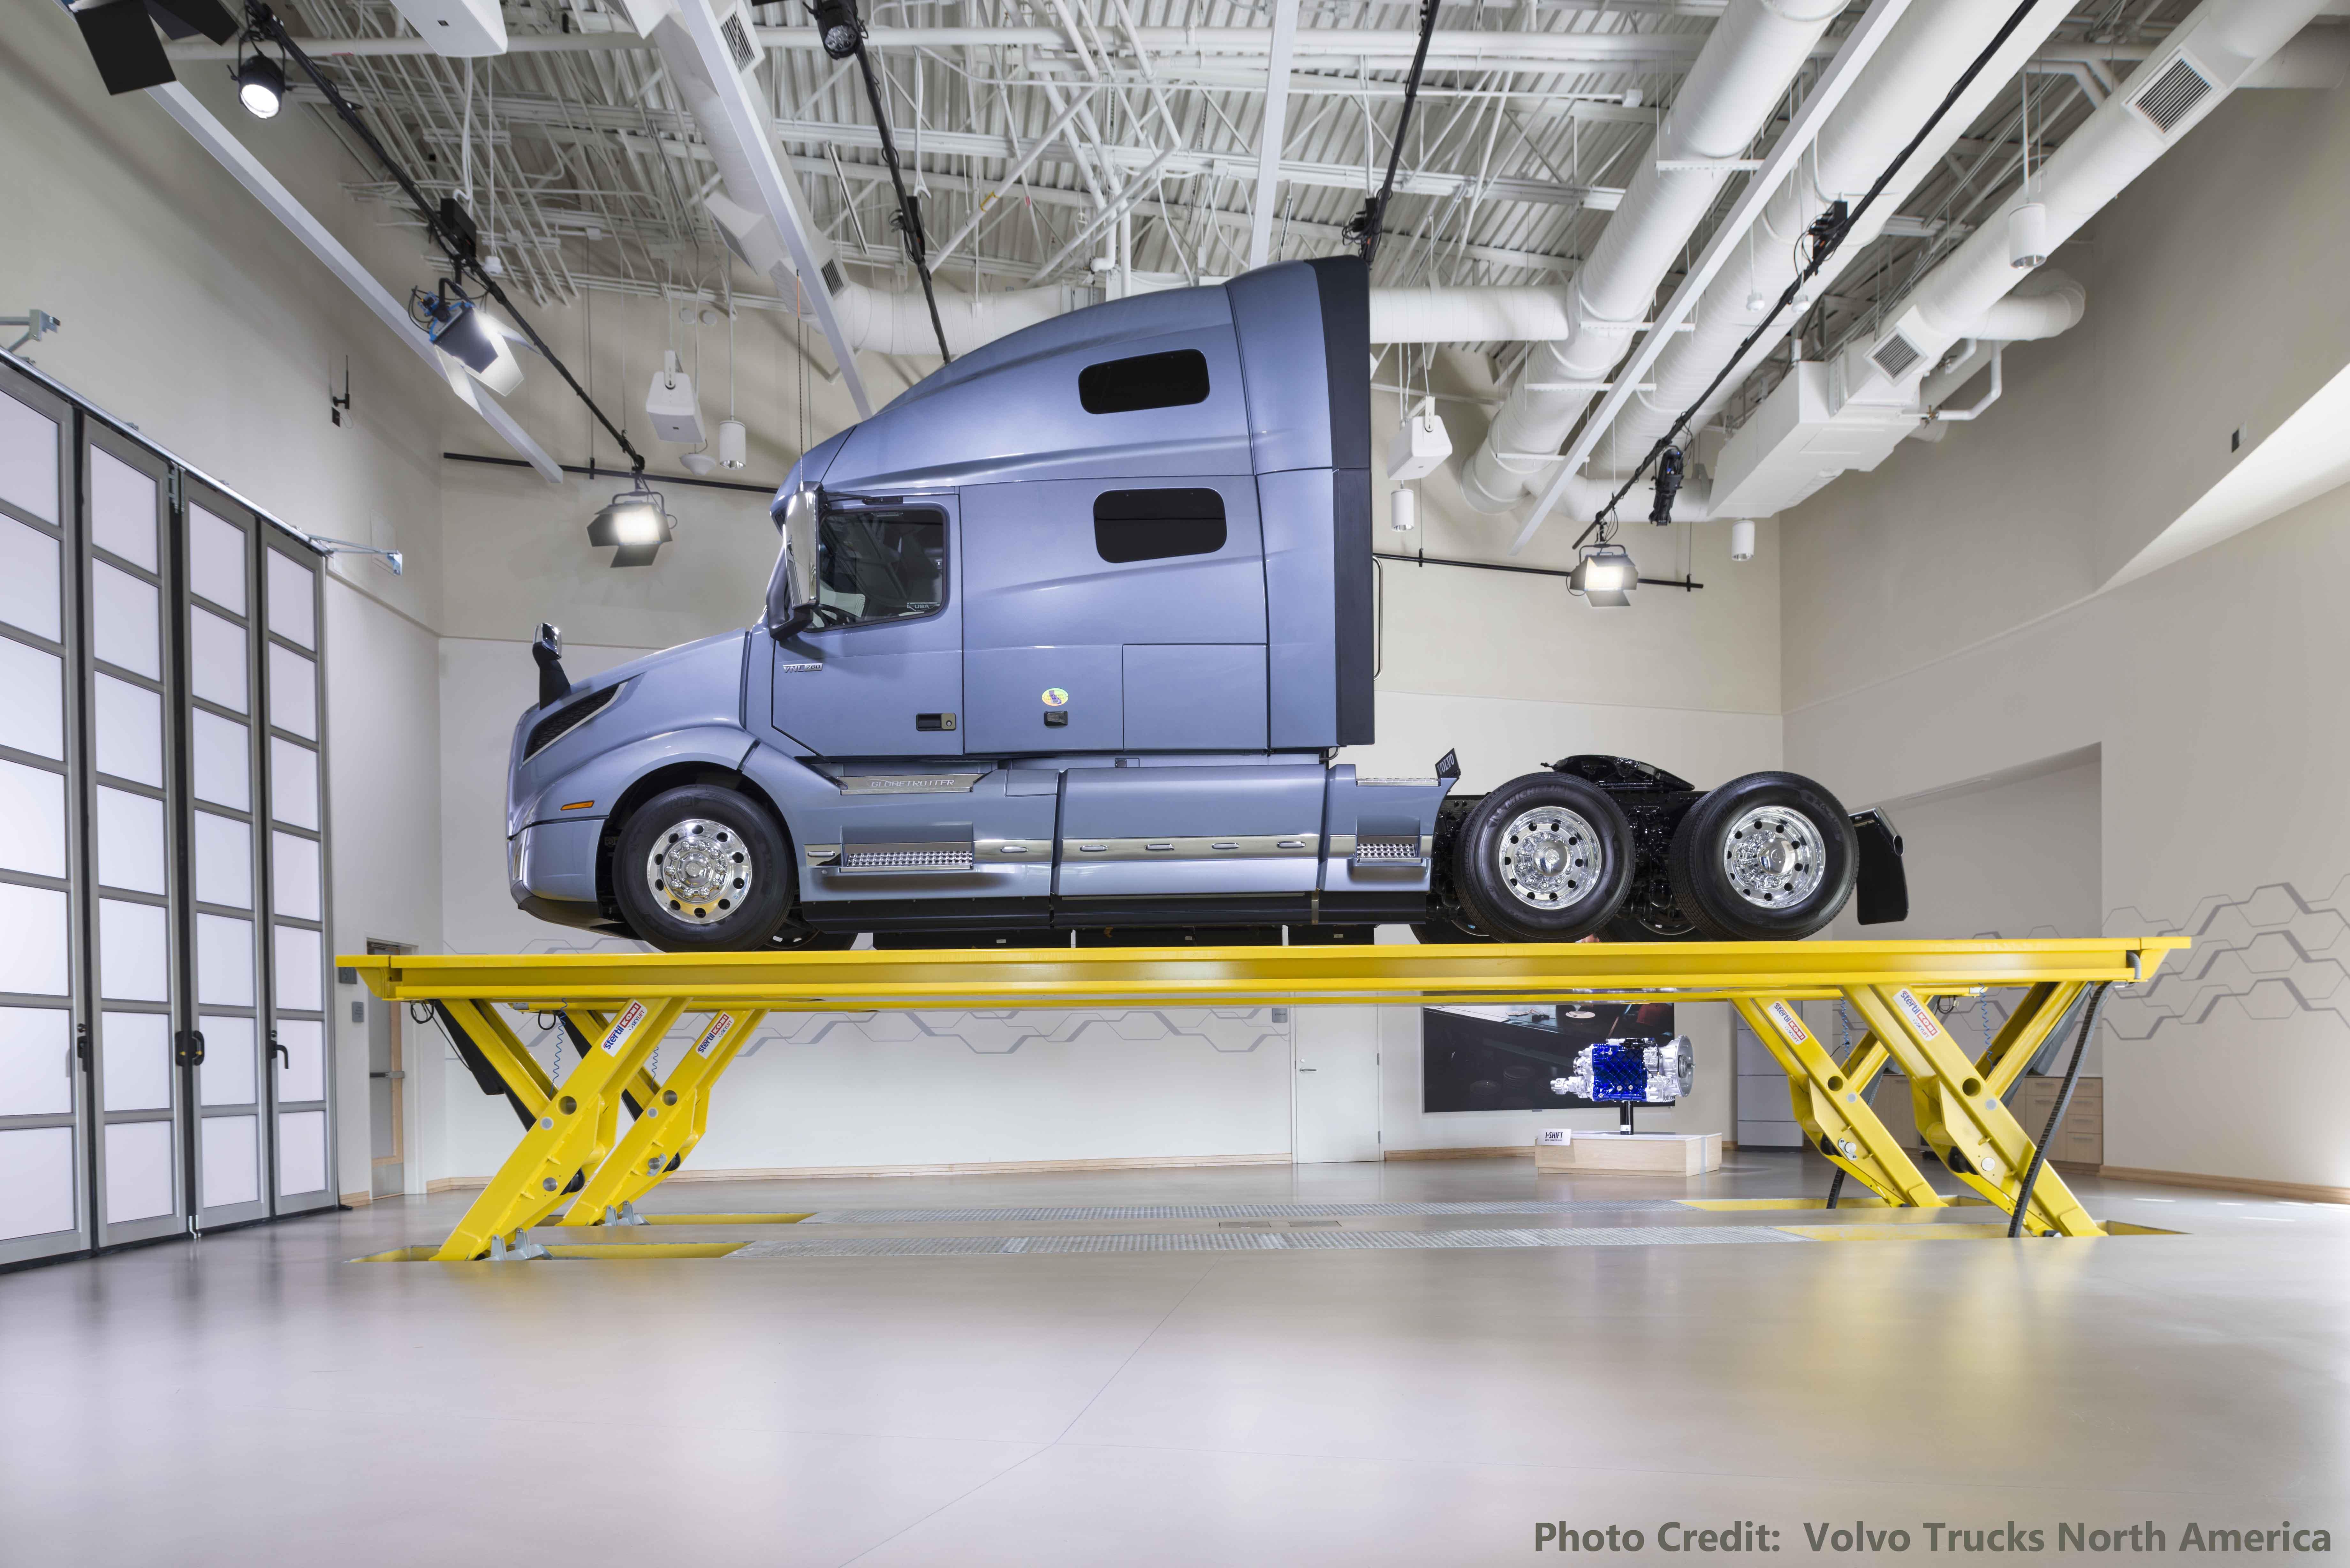 new volvo trucks customer center features skylift | stertil-koni usa